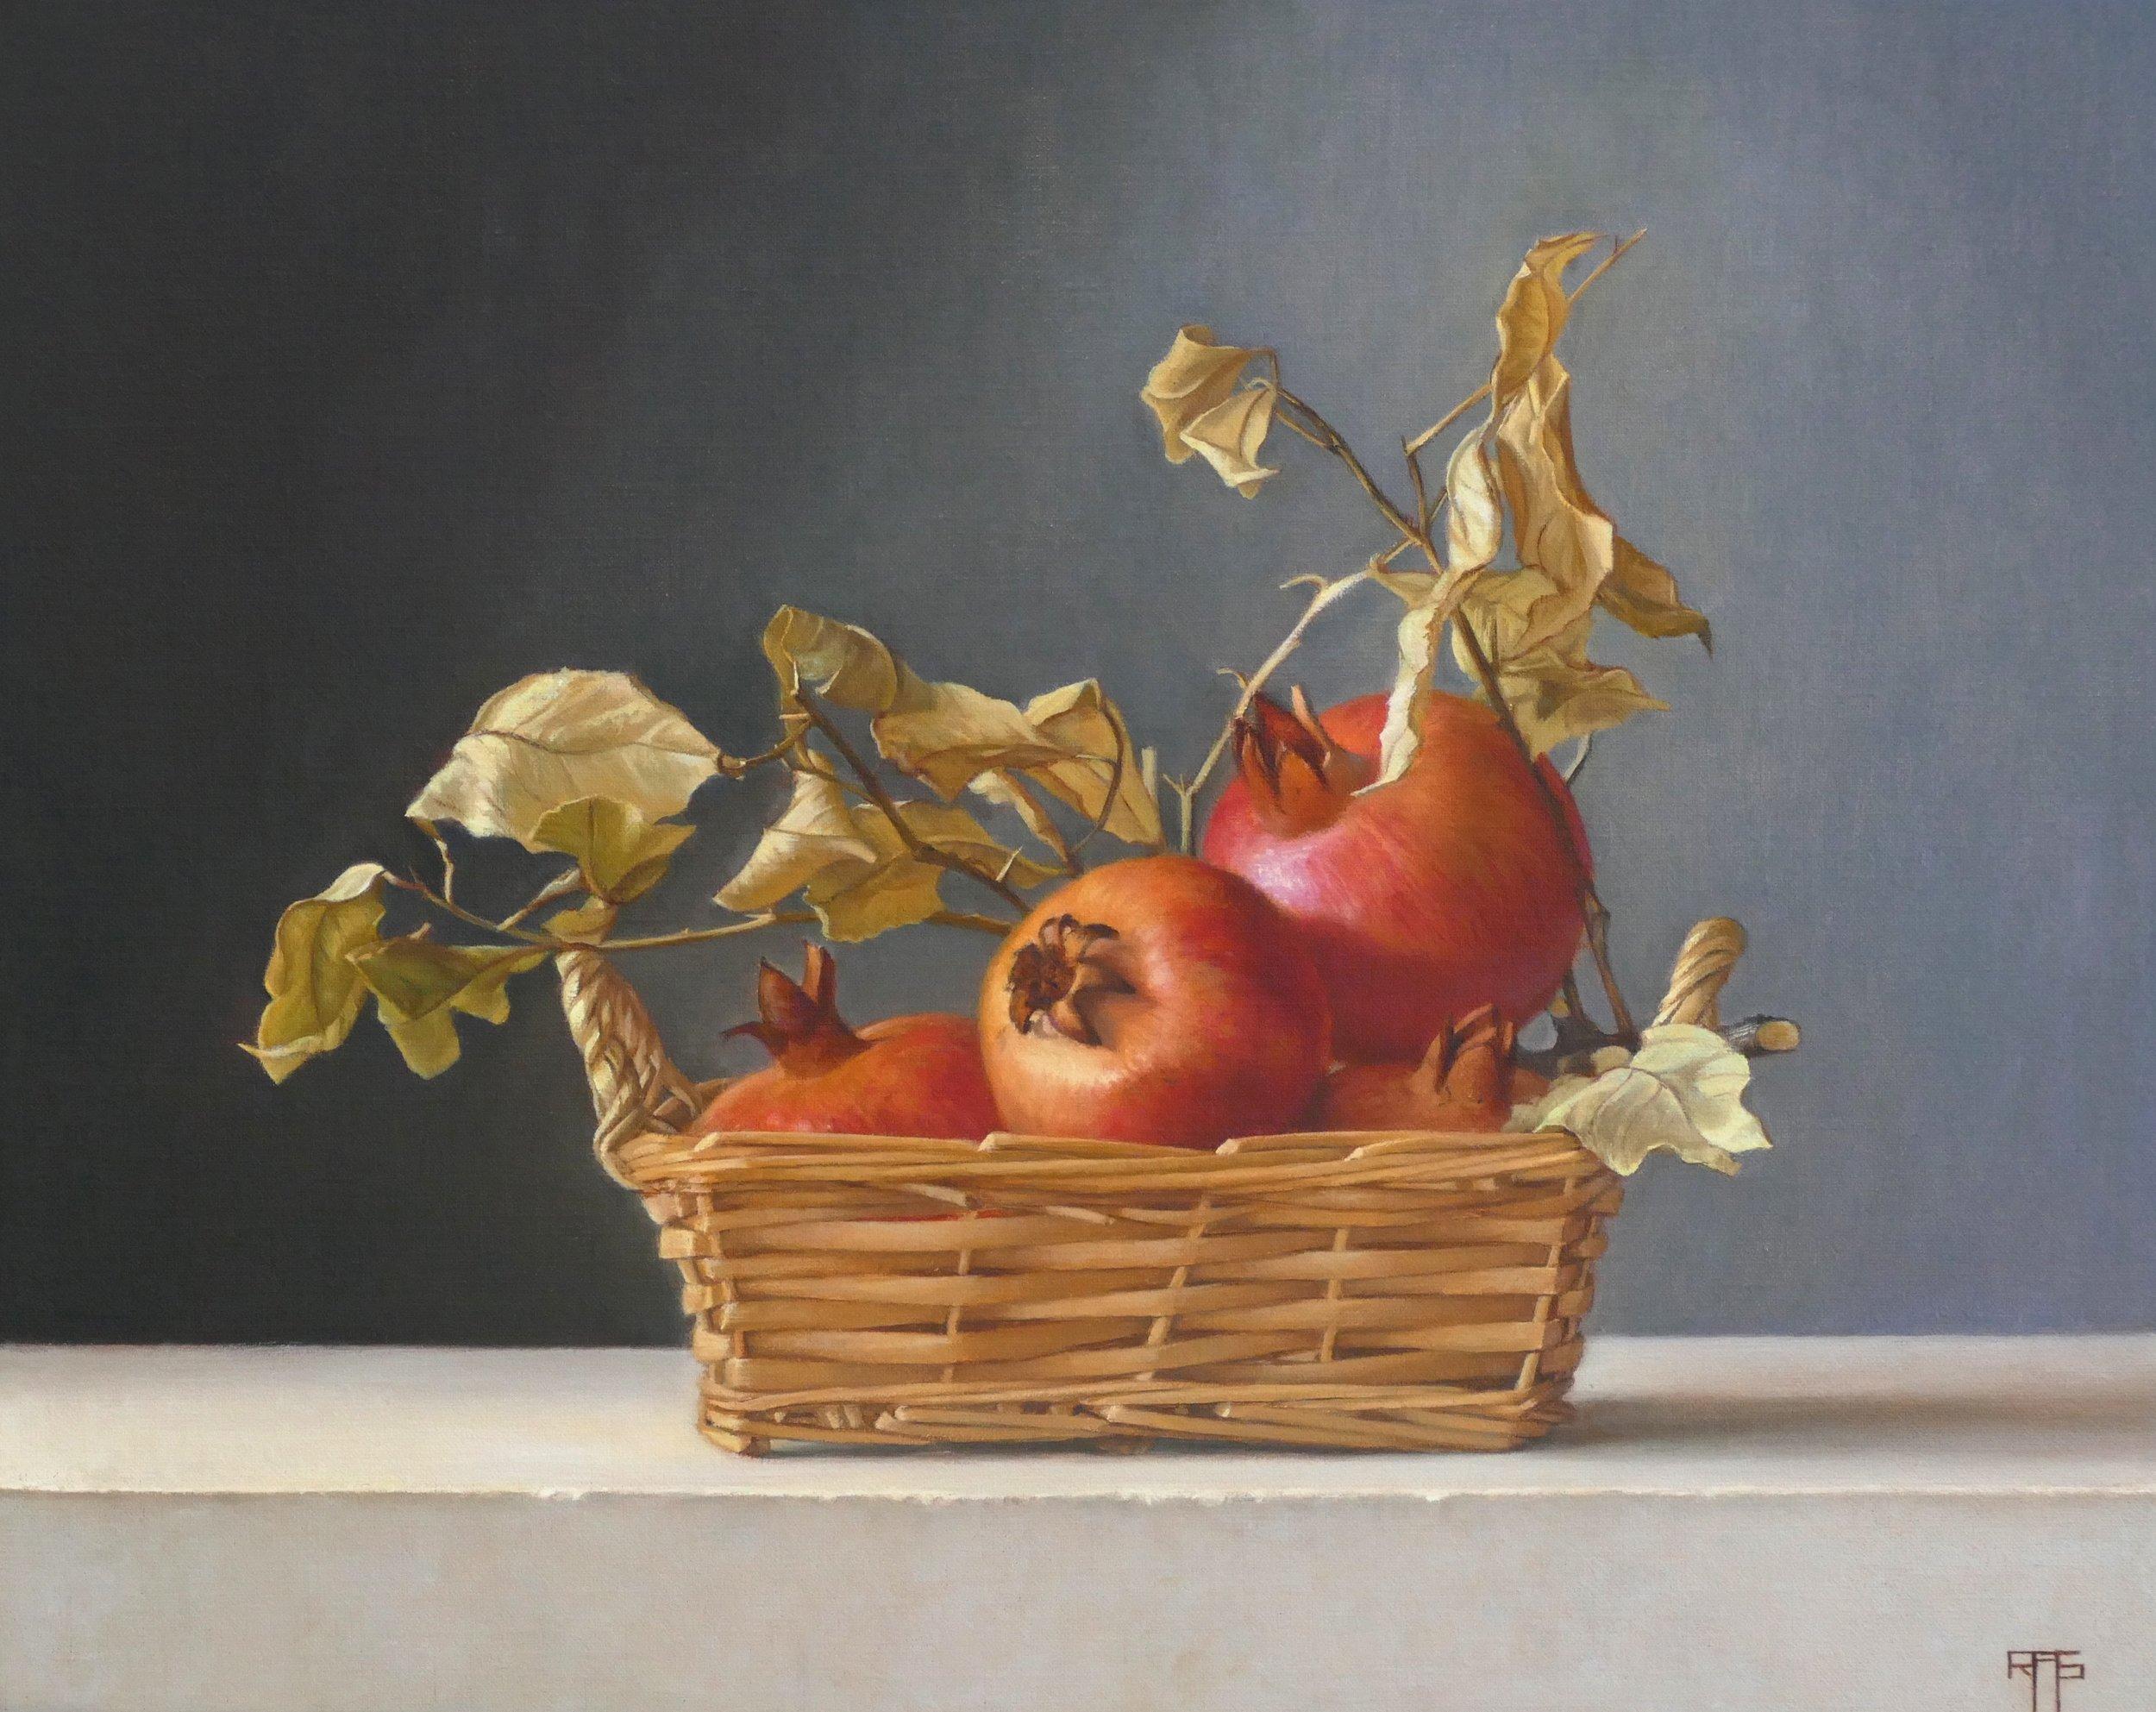 Pomegranates. Oil on Linen. 45x36 cm